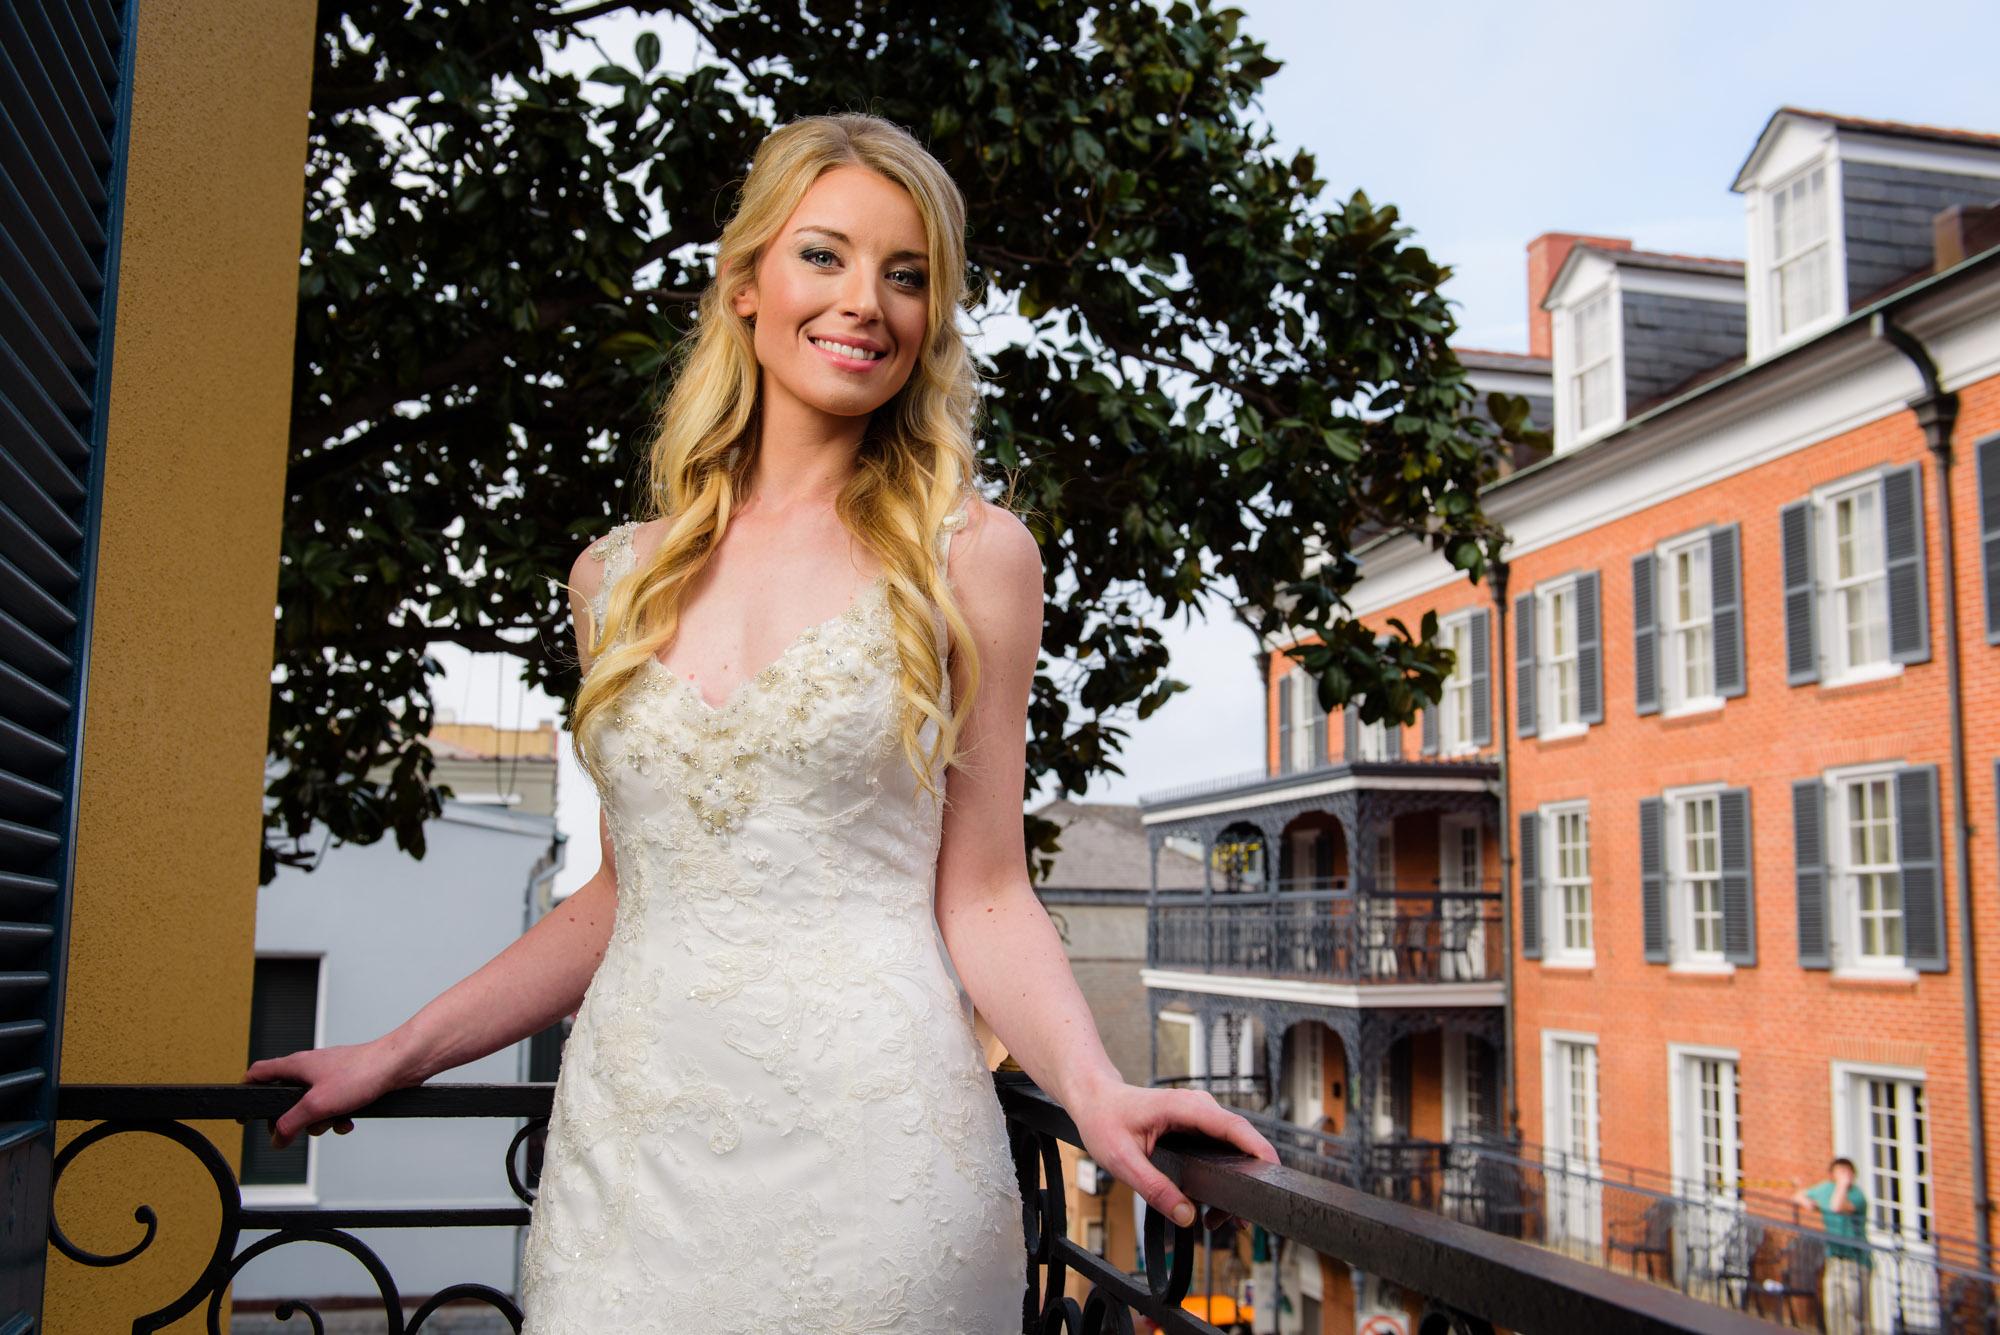 Bridal portrait at New Orleans' Hotel Mazarin